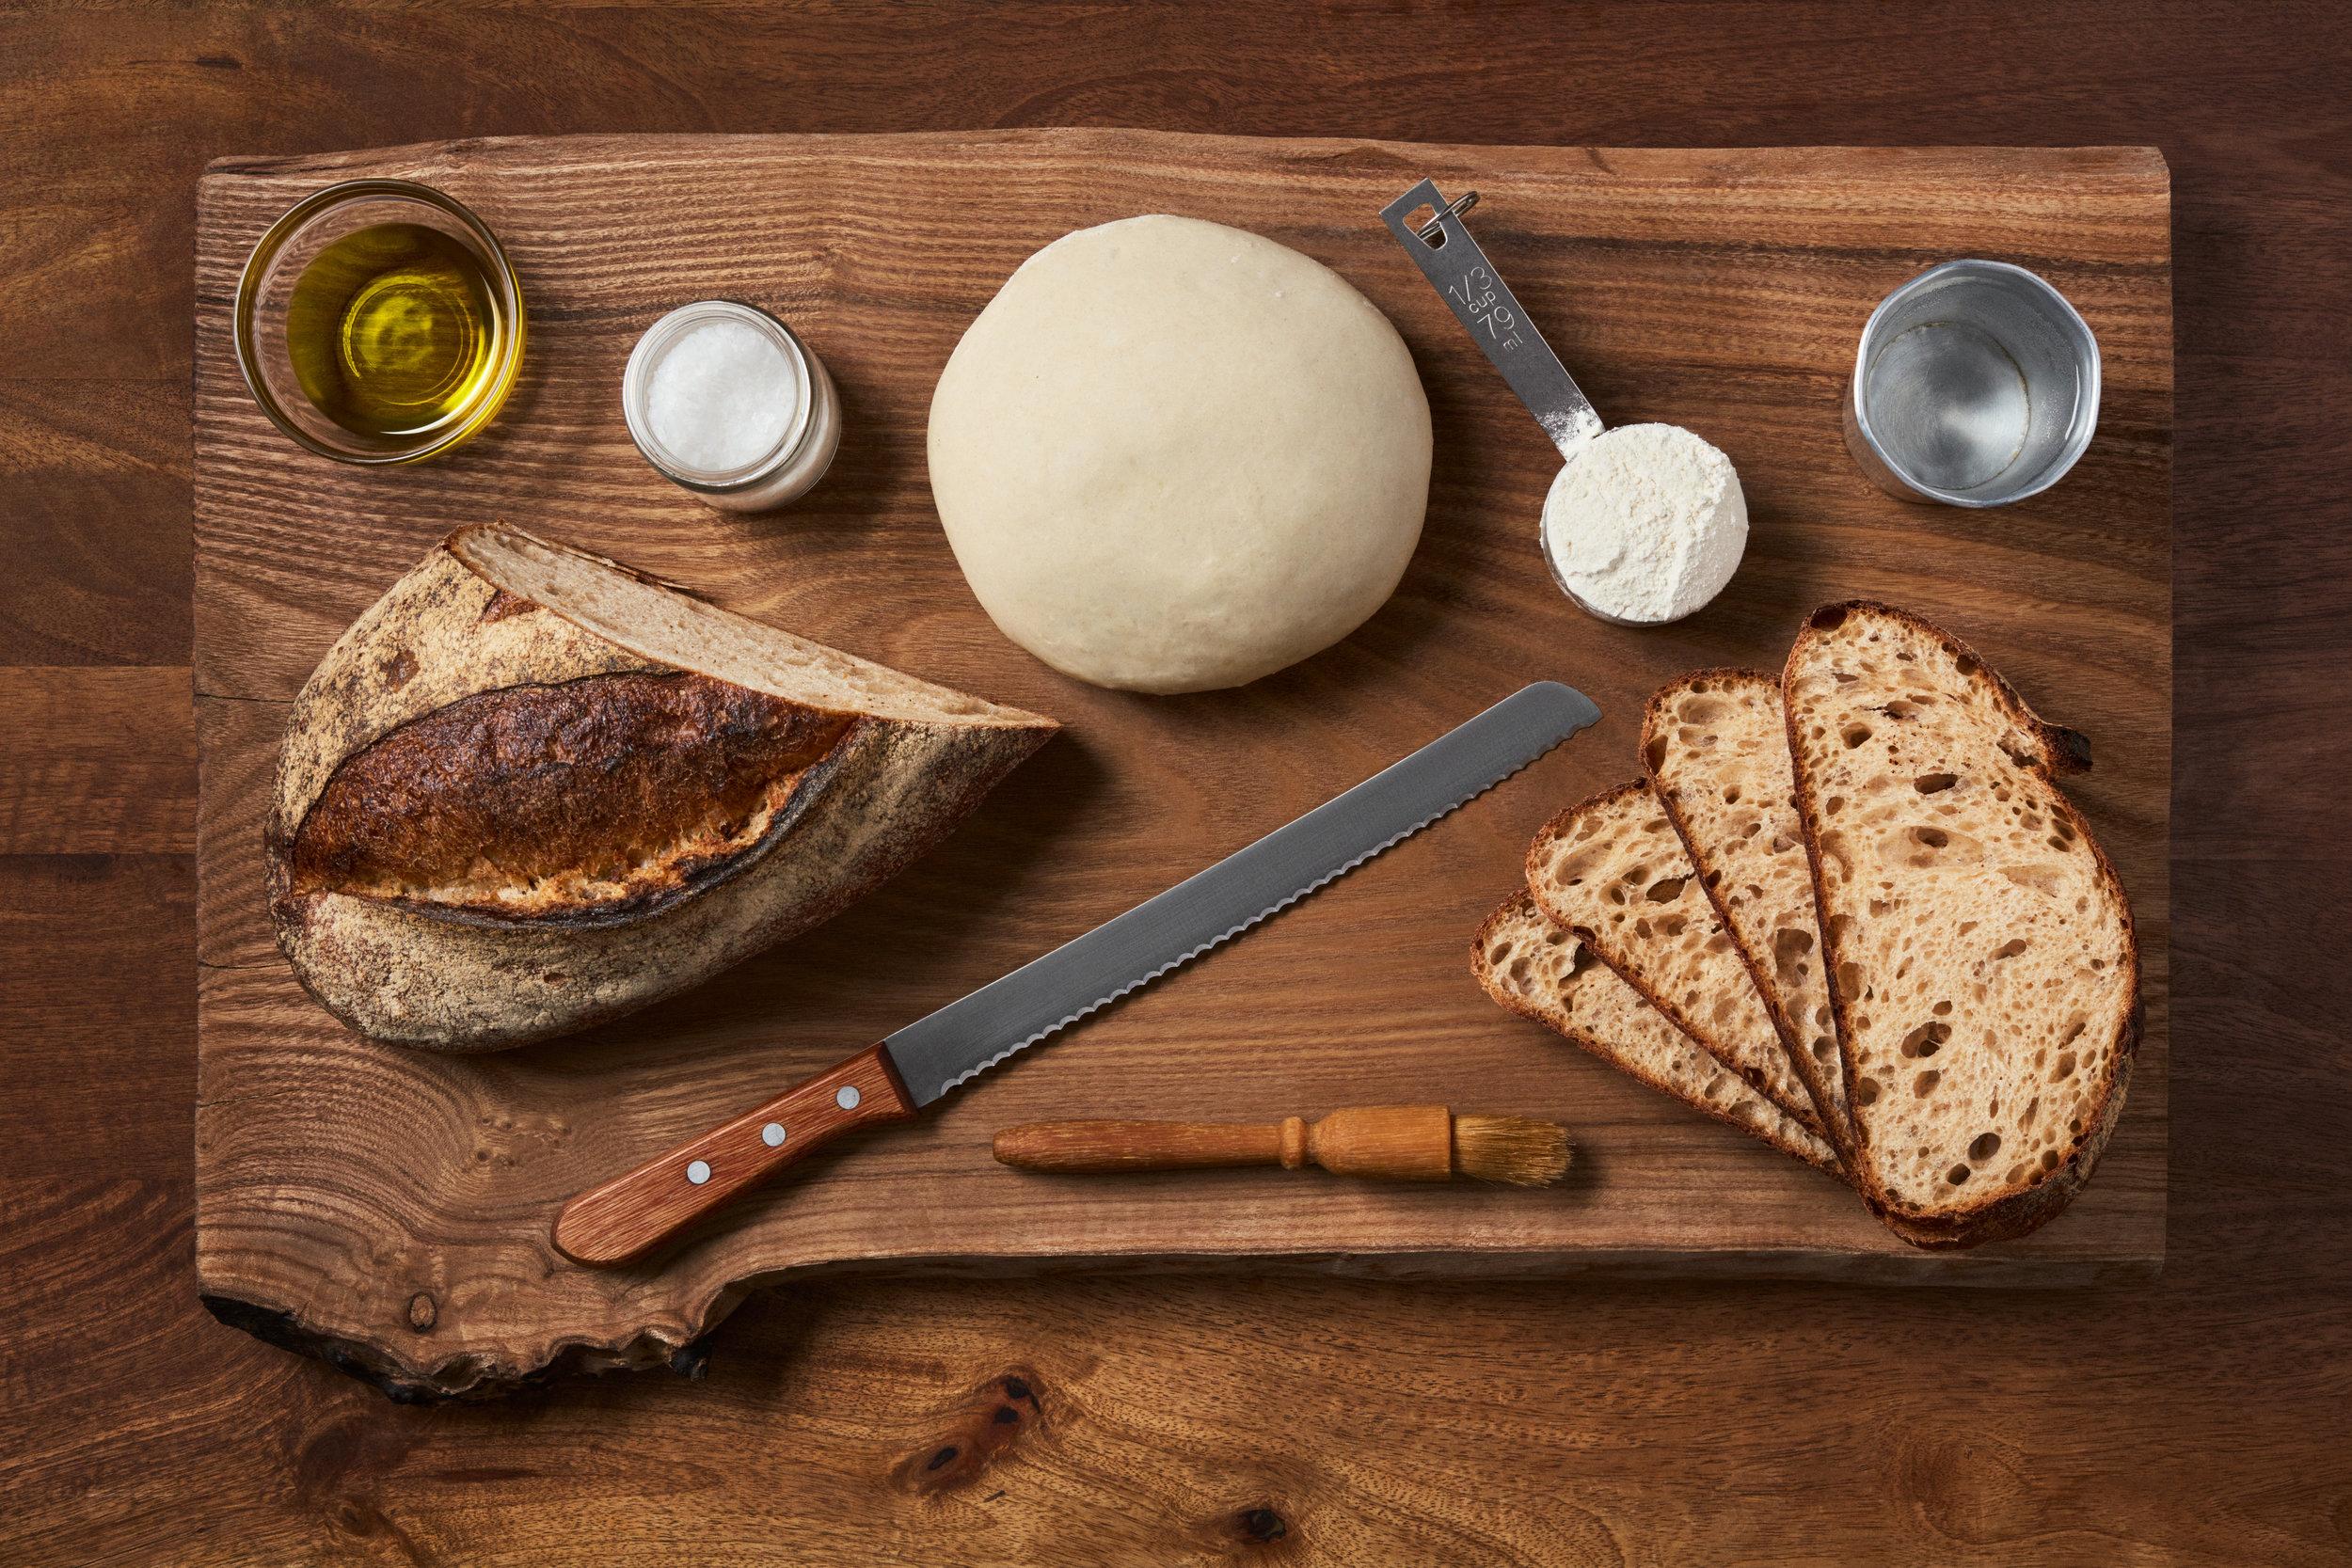 1558-16f-Shot4_Still_Life-_Bread-Ingredients_304 2-RGB.jpg